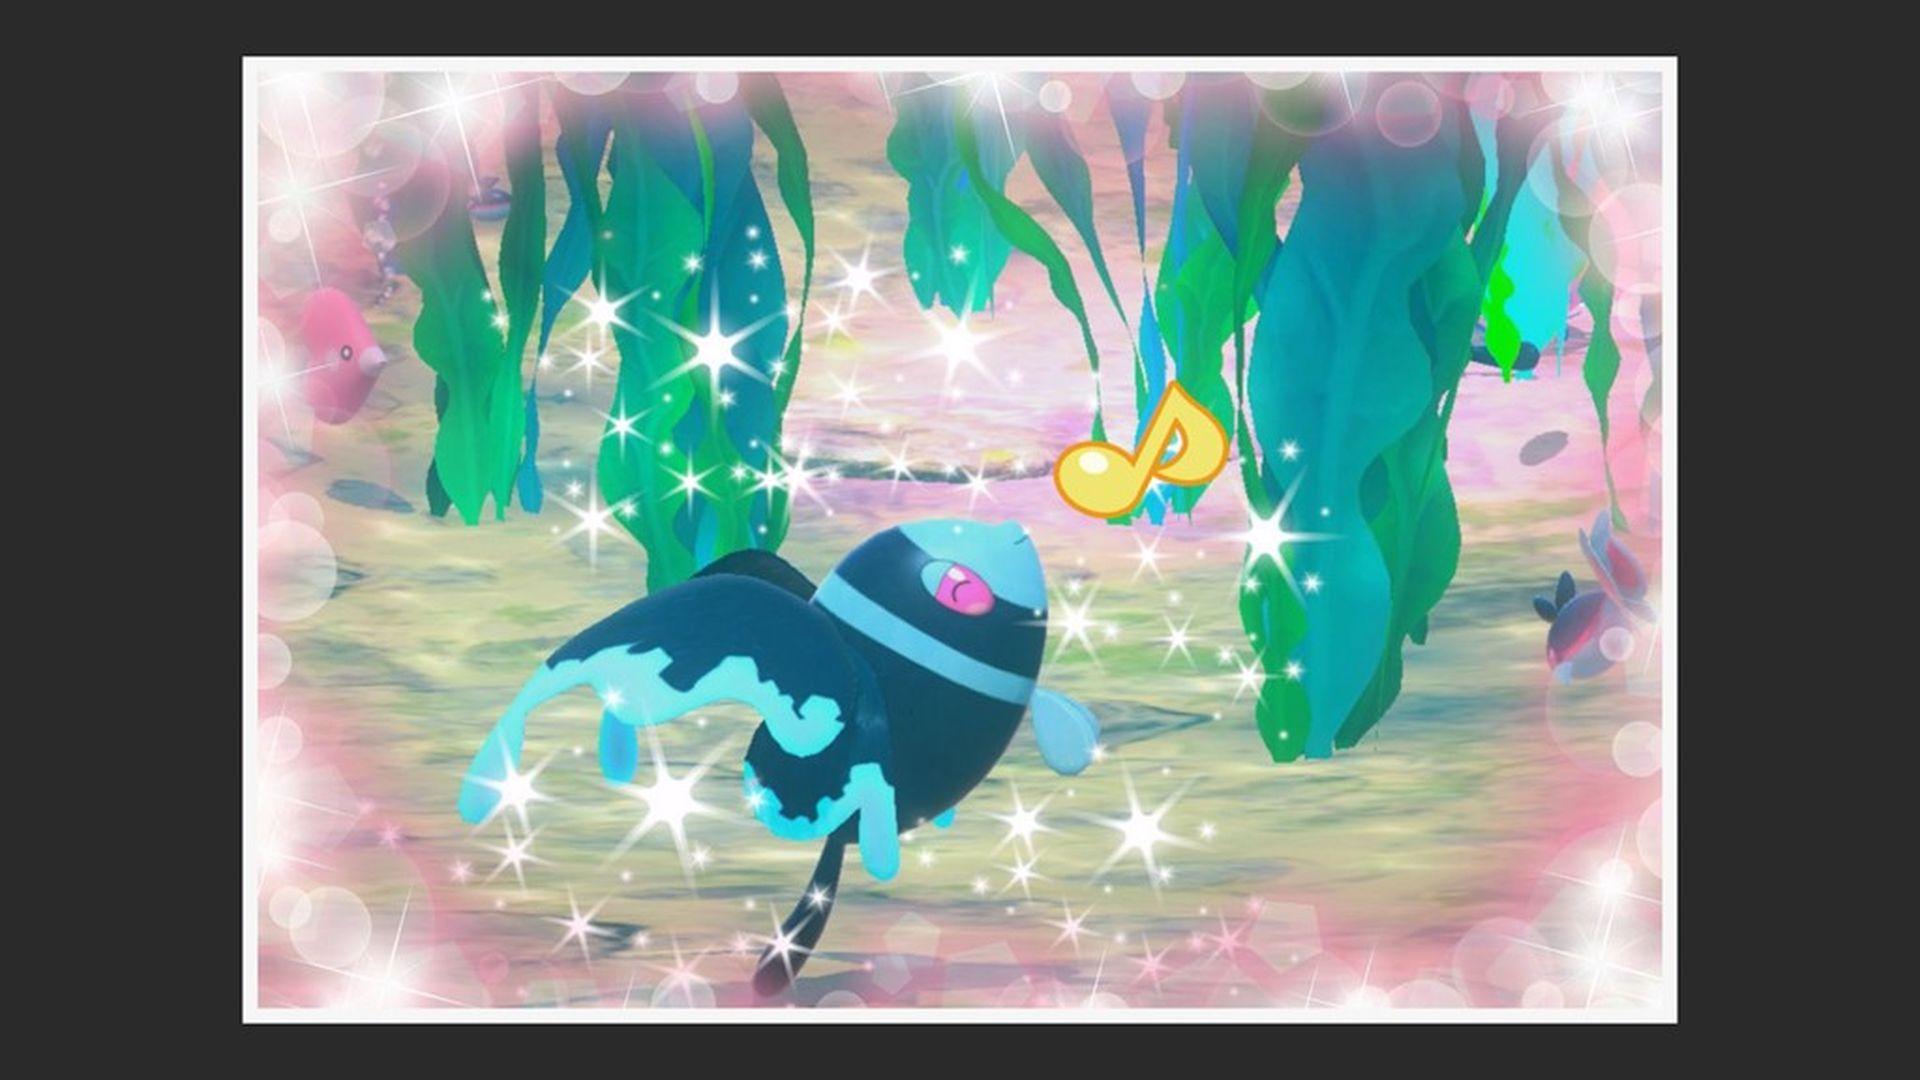 New Pokemon Snap - Music